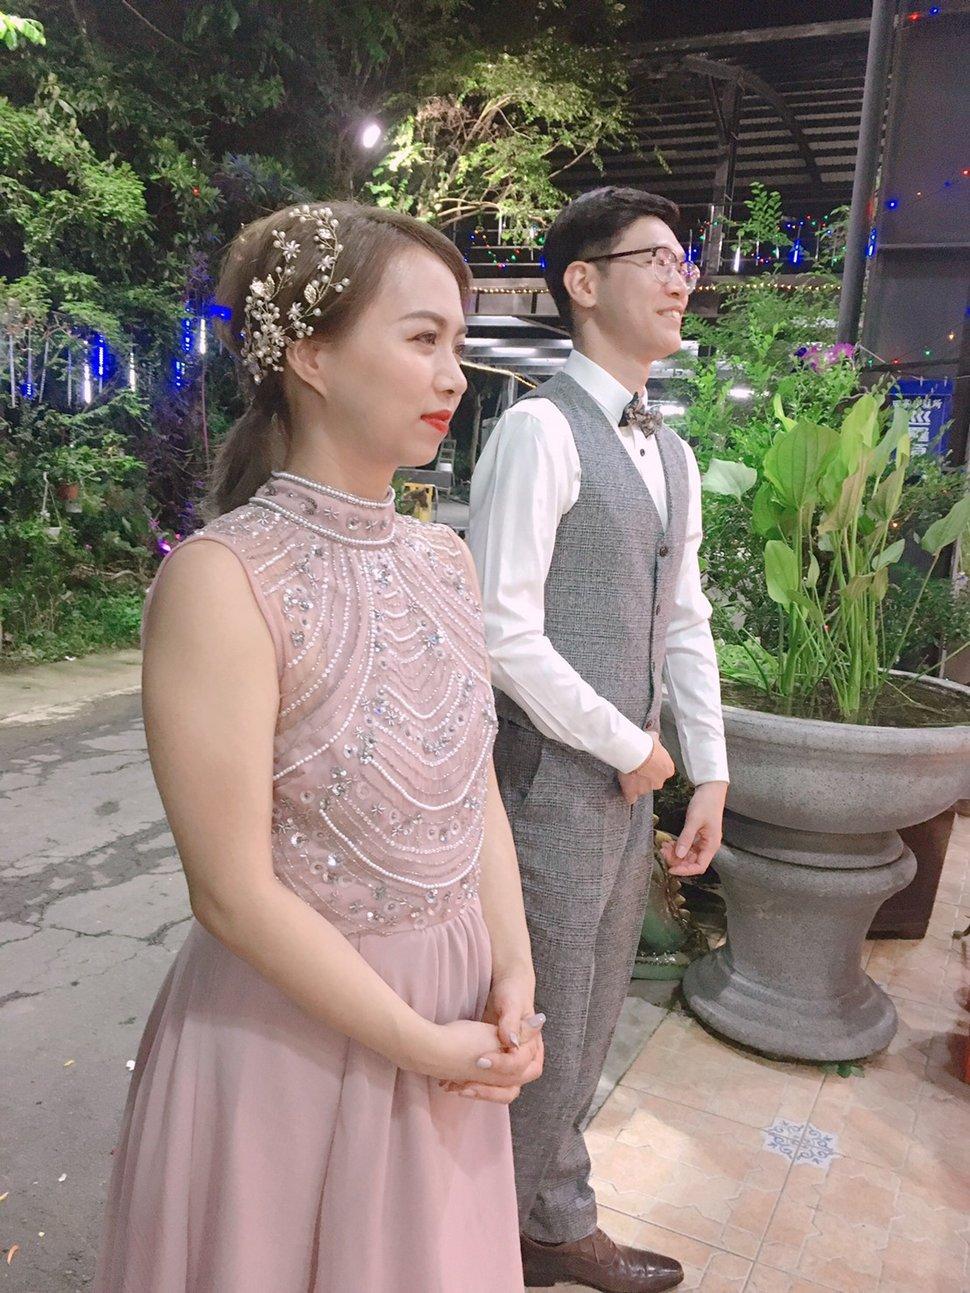 2019410_190410_0091 - Zona時尚美甲x新娘秘書整體造型工作室《結婚吧》